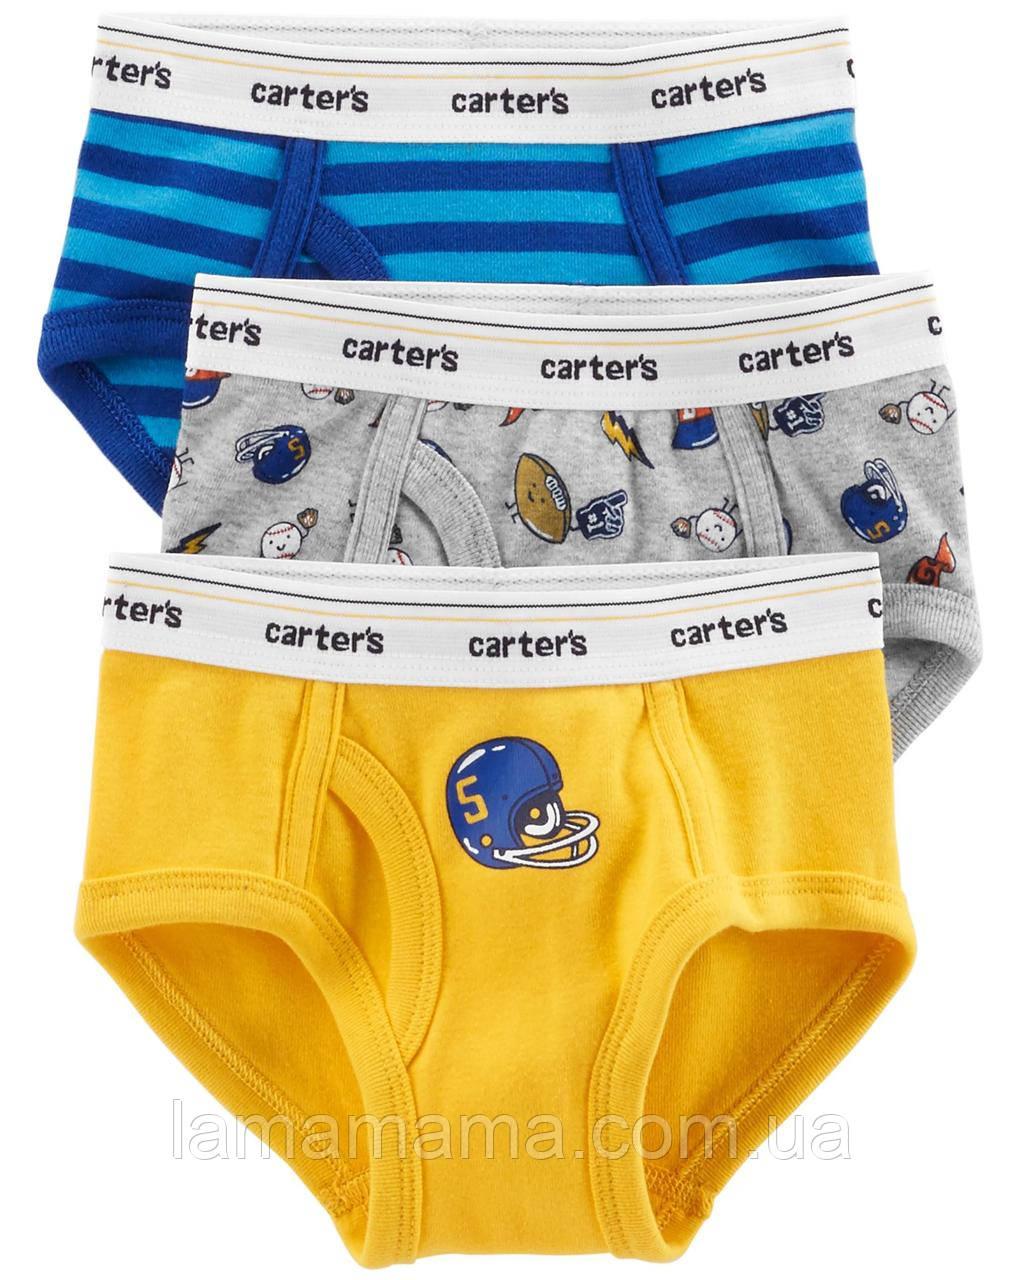 Набор из 3 трусиков Бейсбол Carter's Картерс 3-Pack Cotton Briefs